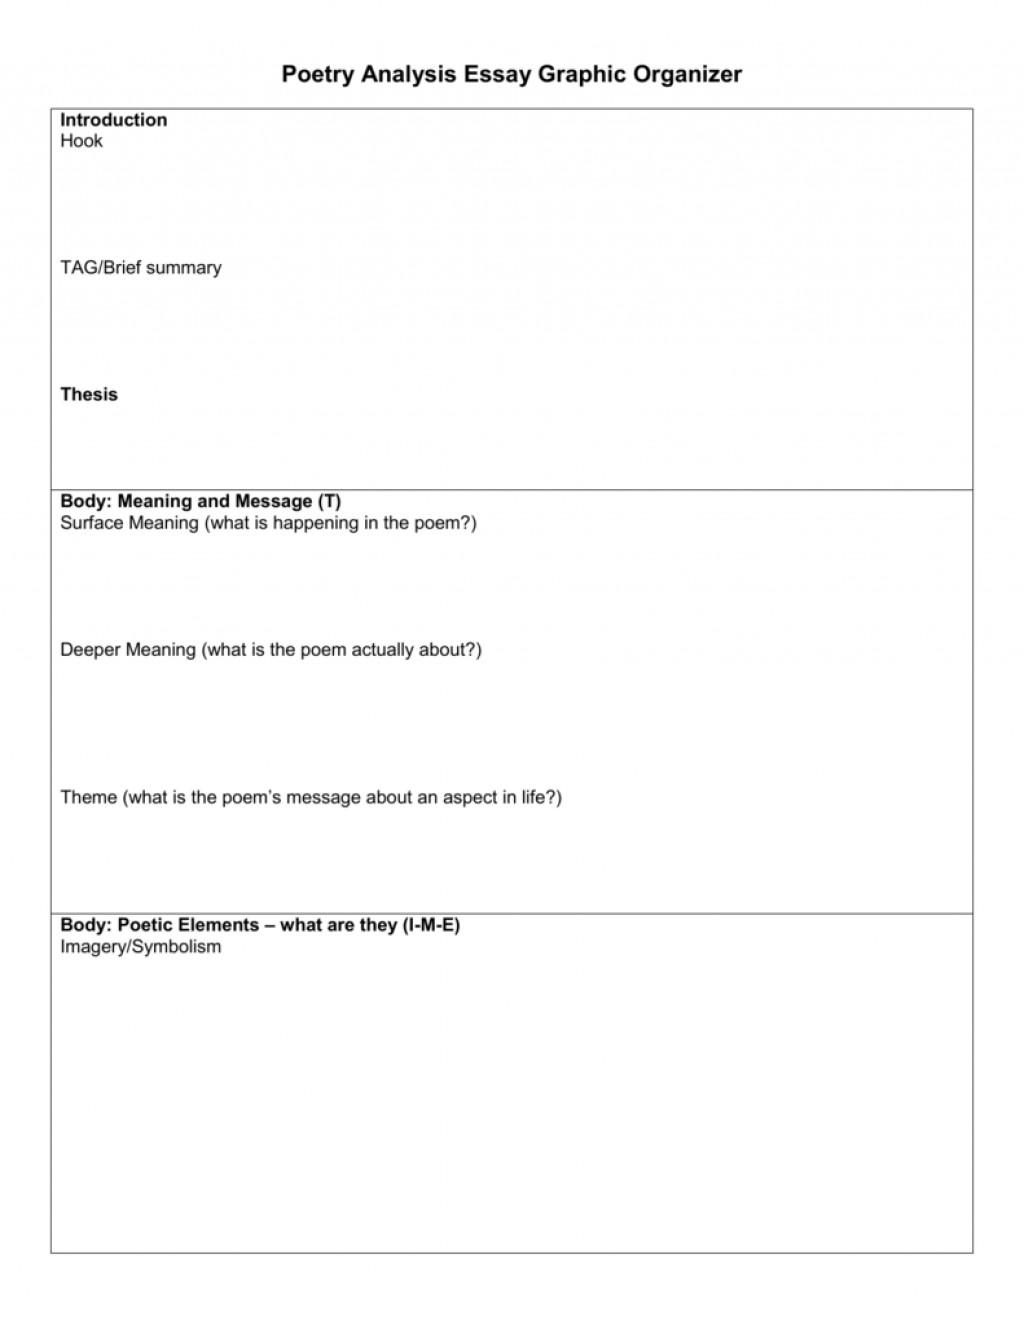 020 008591463 1 Essay Graphic Organizer Incredible Narrative Pdf Persuasive Middle School Literary 5th Grade Large